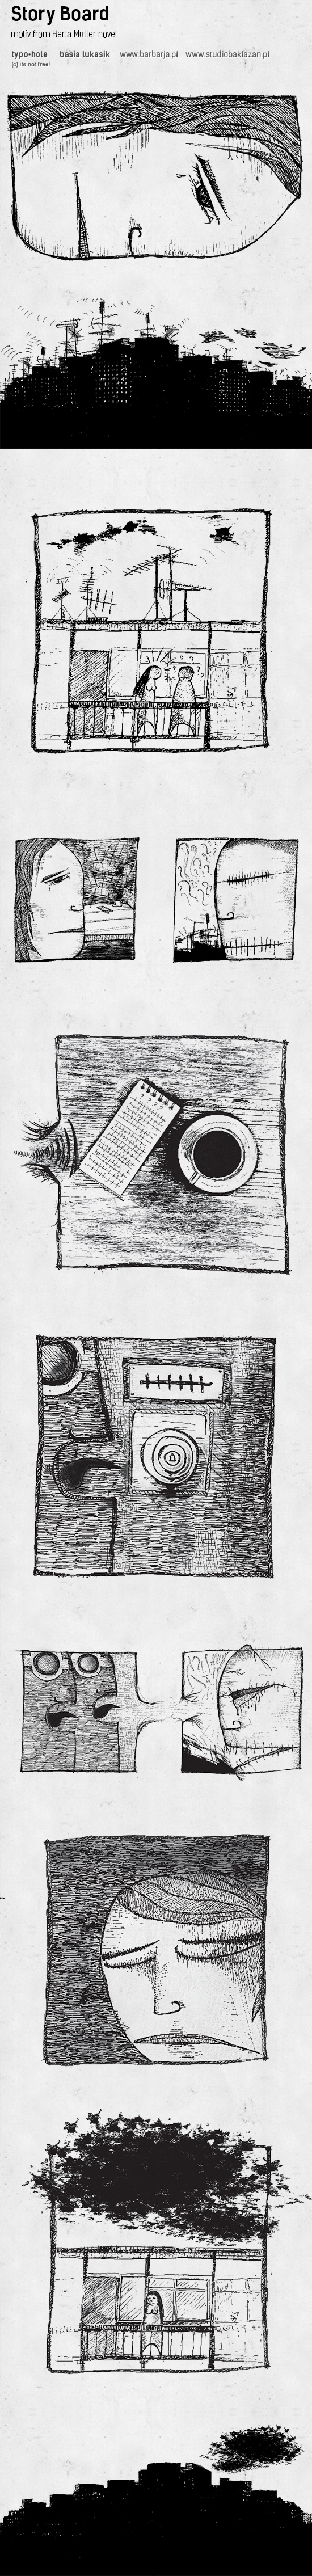 Story board from herta muller (nobel prize) novel. komix about desire, love, and lost   ...............  www.studiobaklazan.pl  www.barbarja.pl